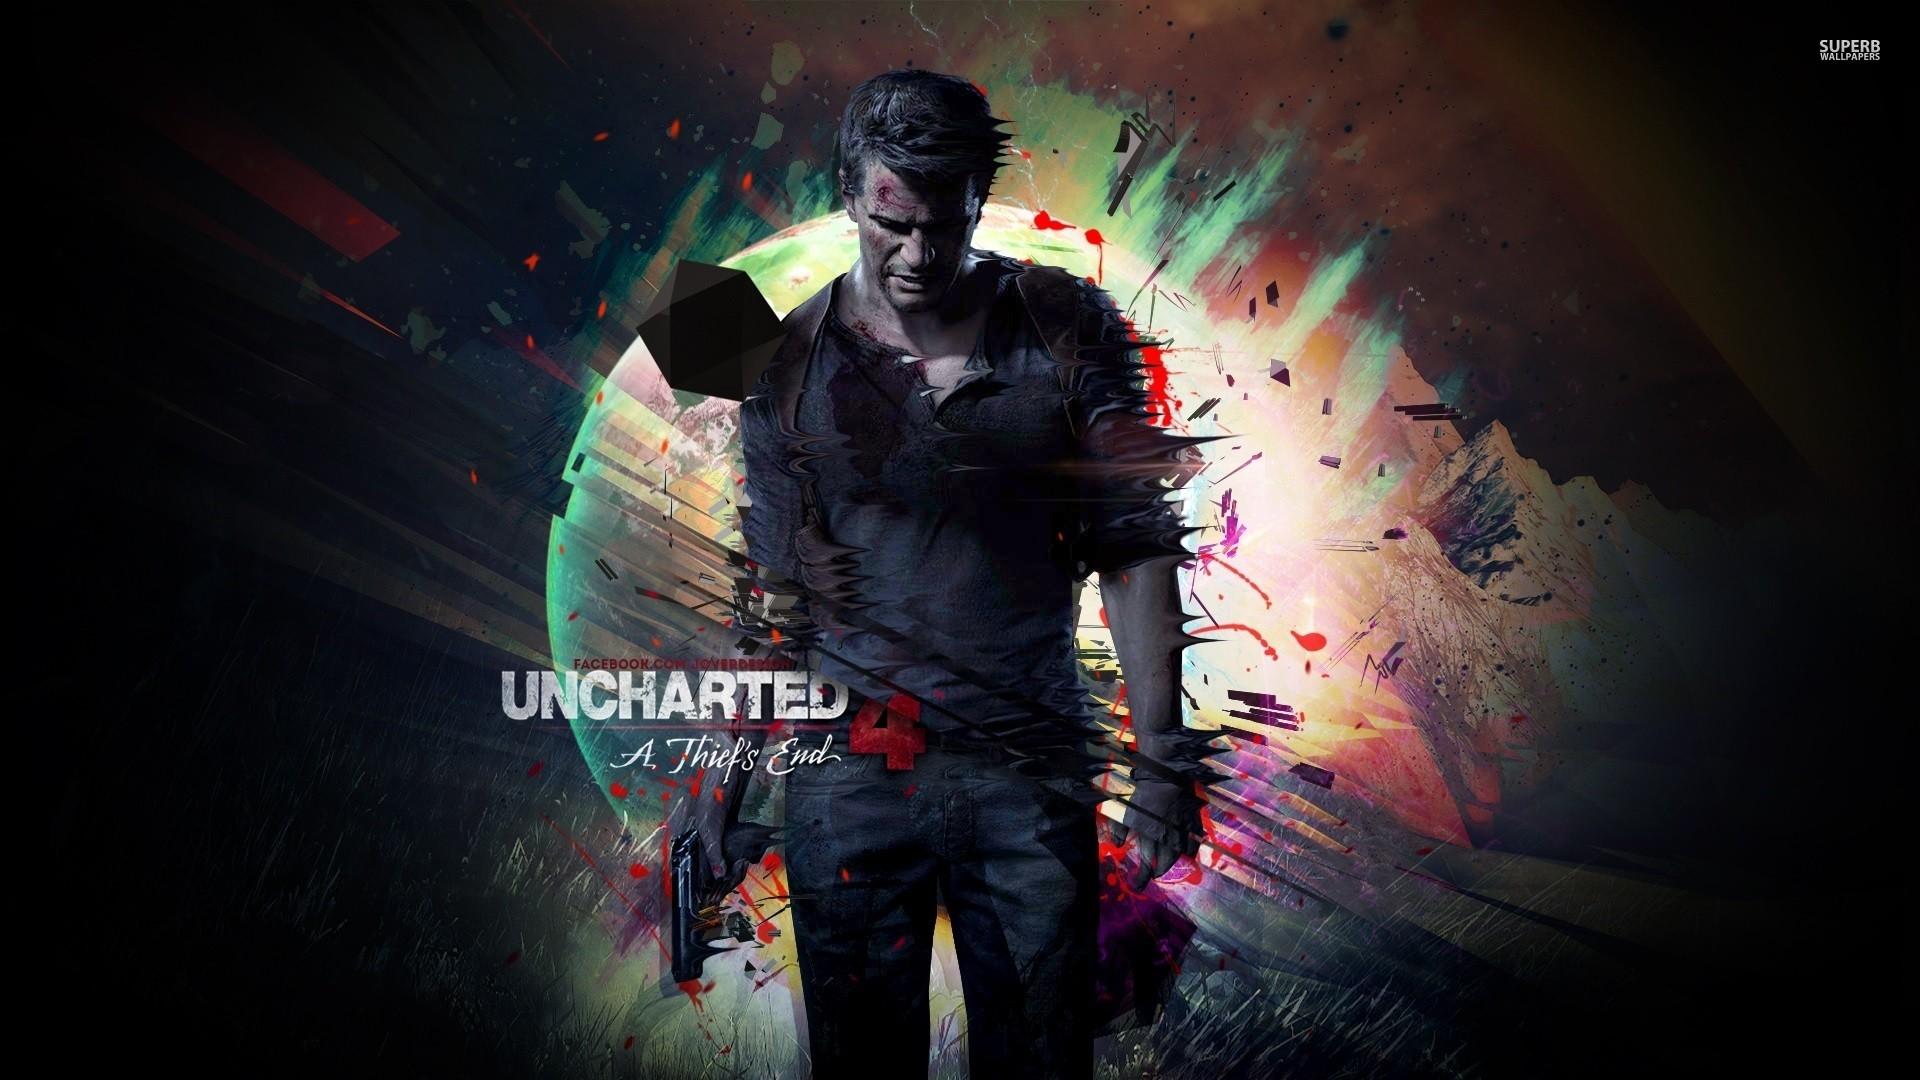 Uncharted 4 HD Wallpaper